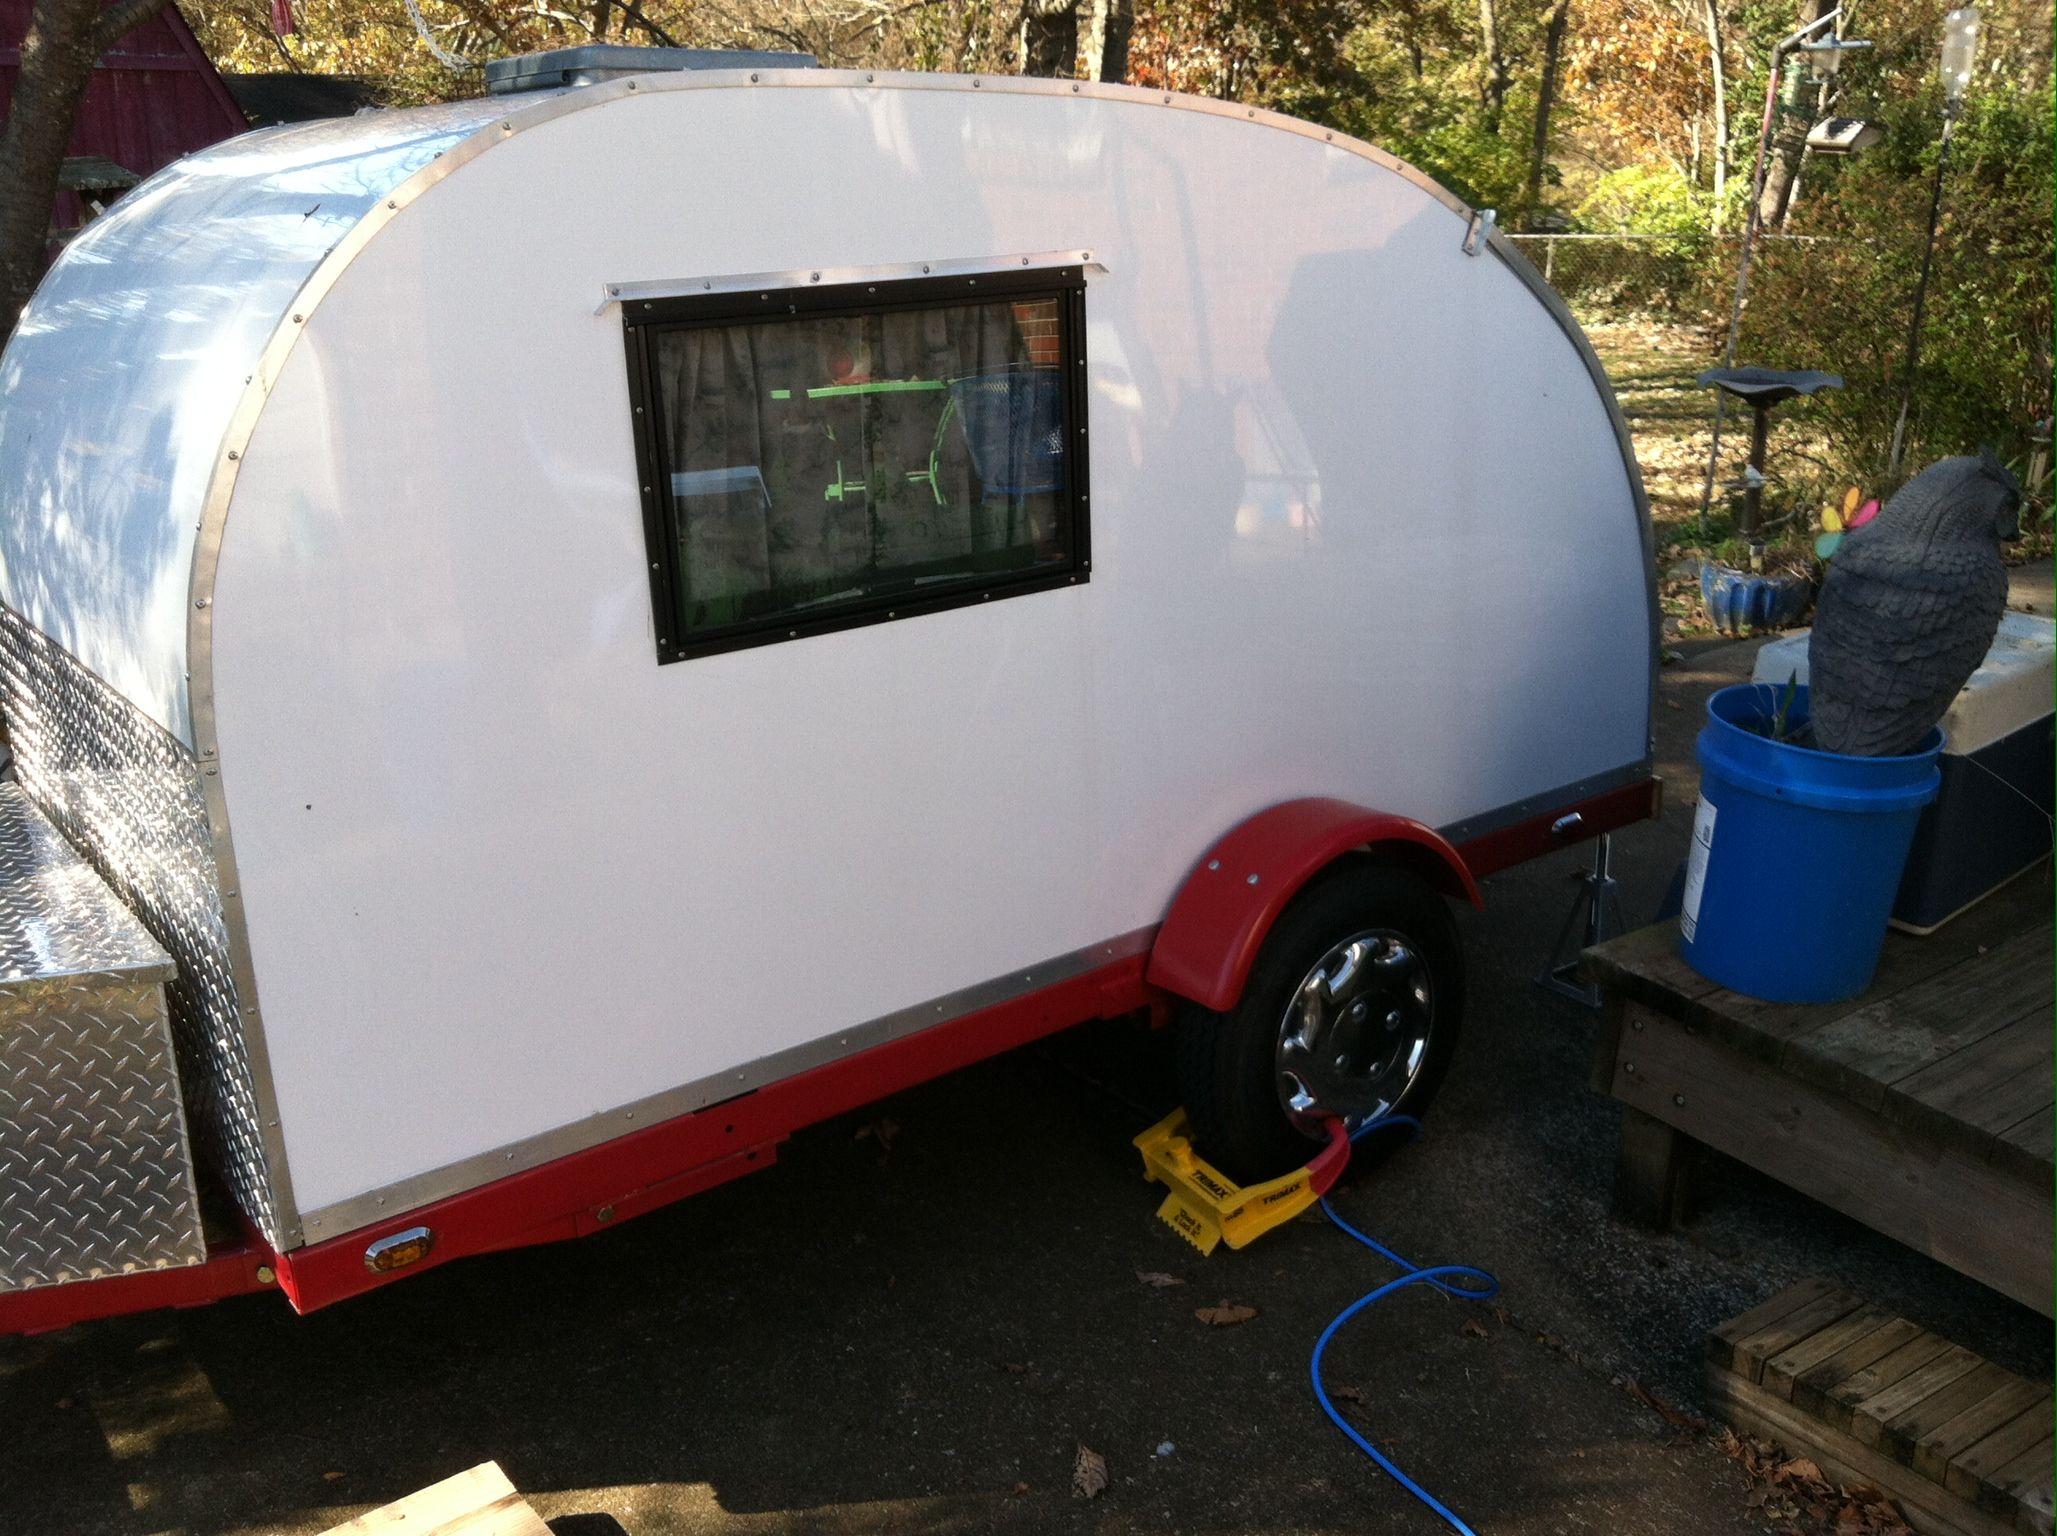 998 pounds of camping fun in a teardrop camper teardrop